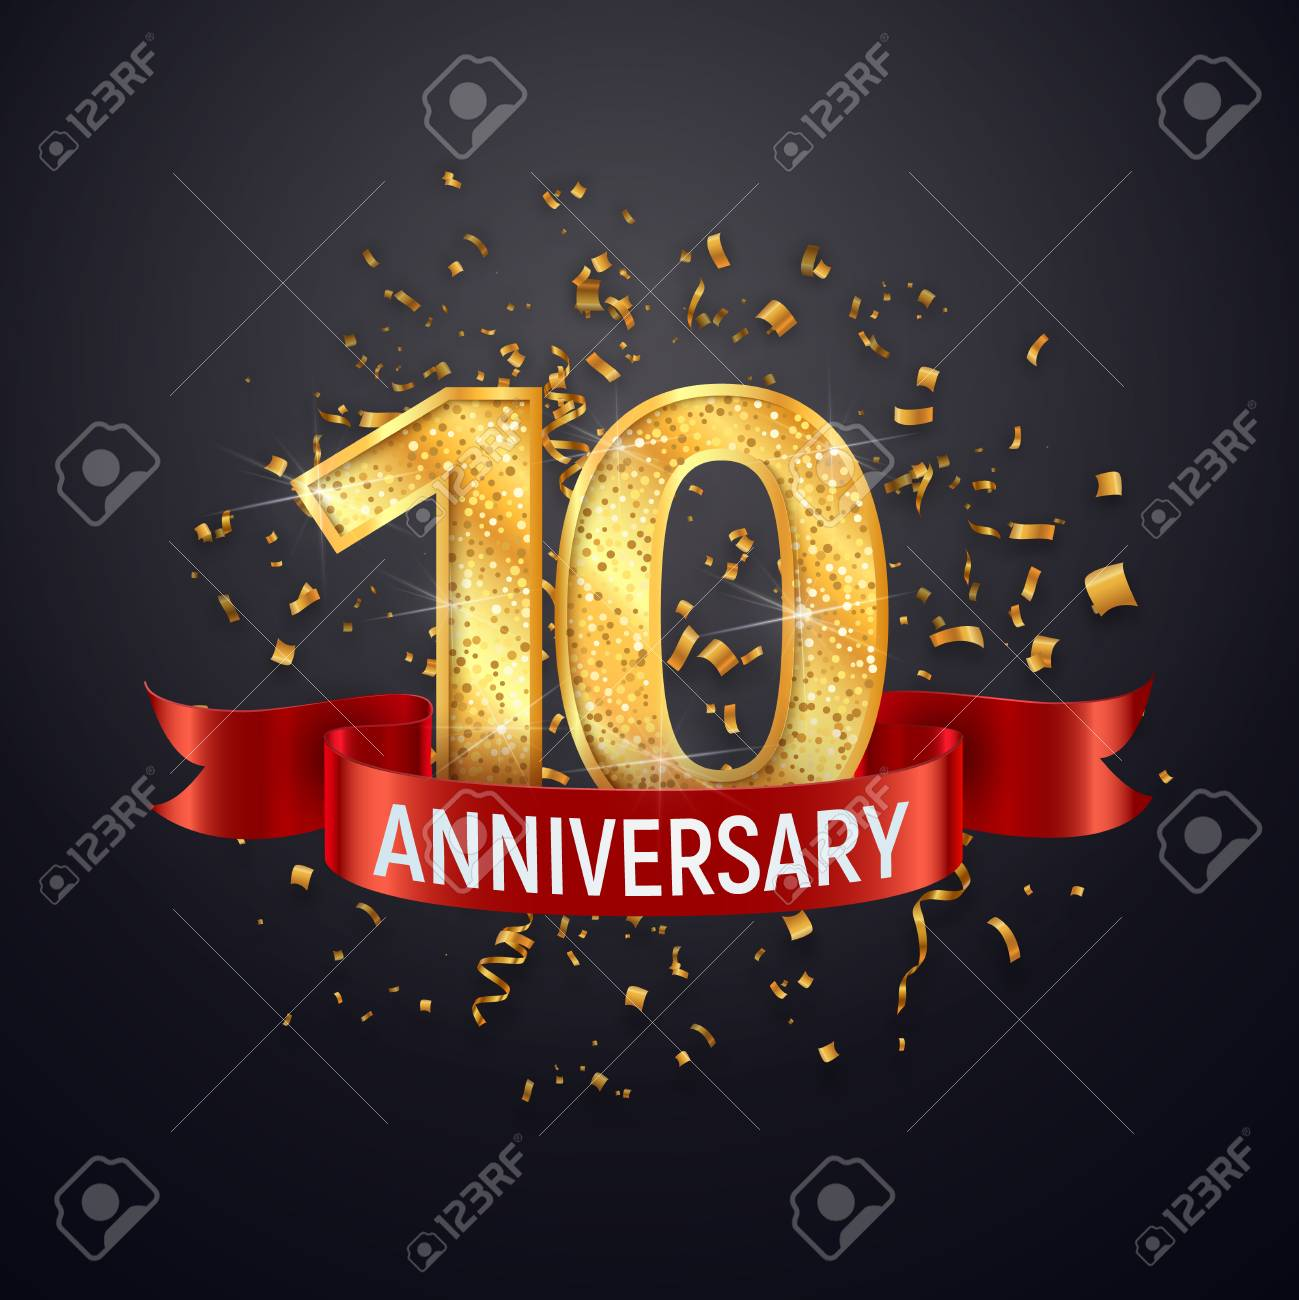 10 years anniversary logo template on dark background tenth